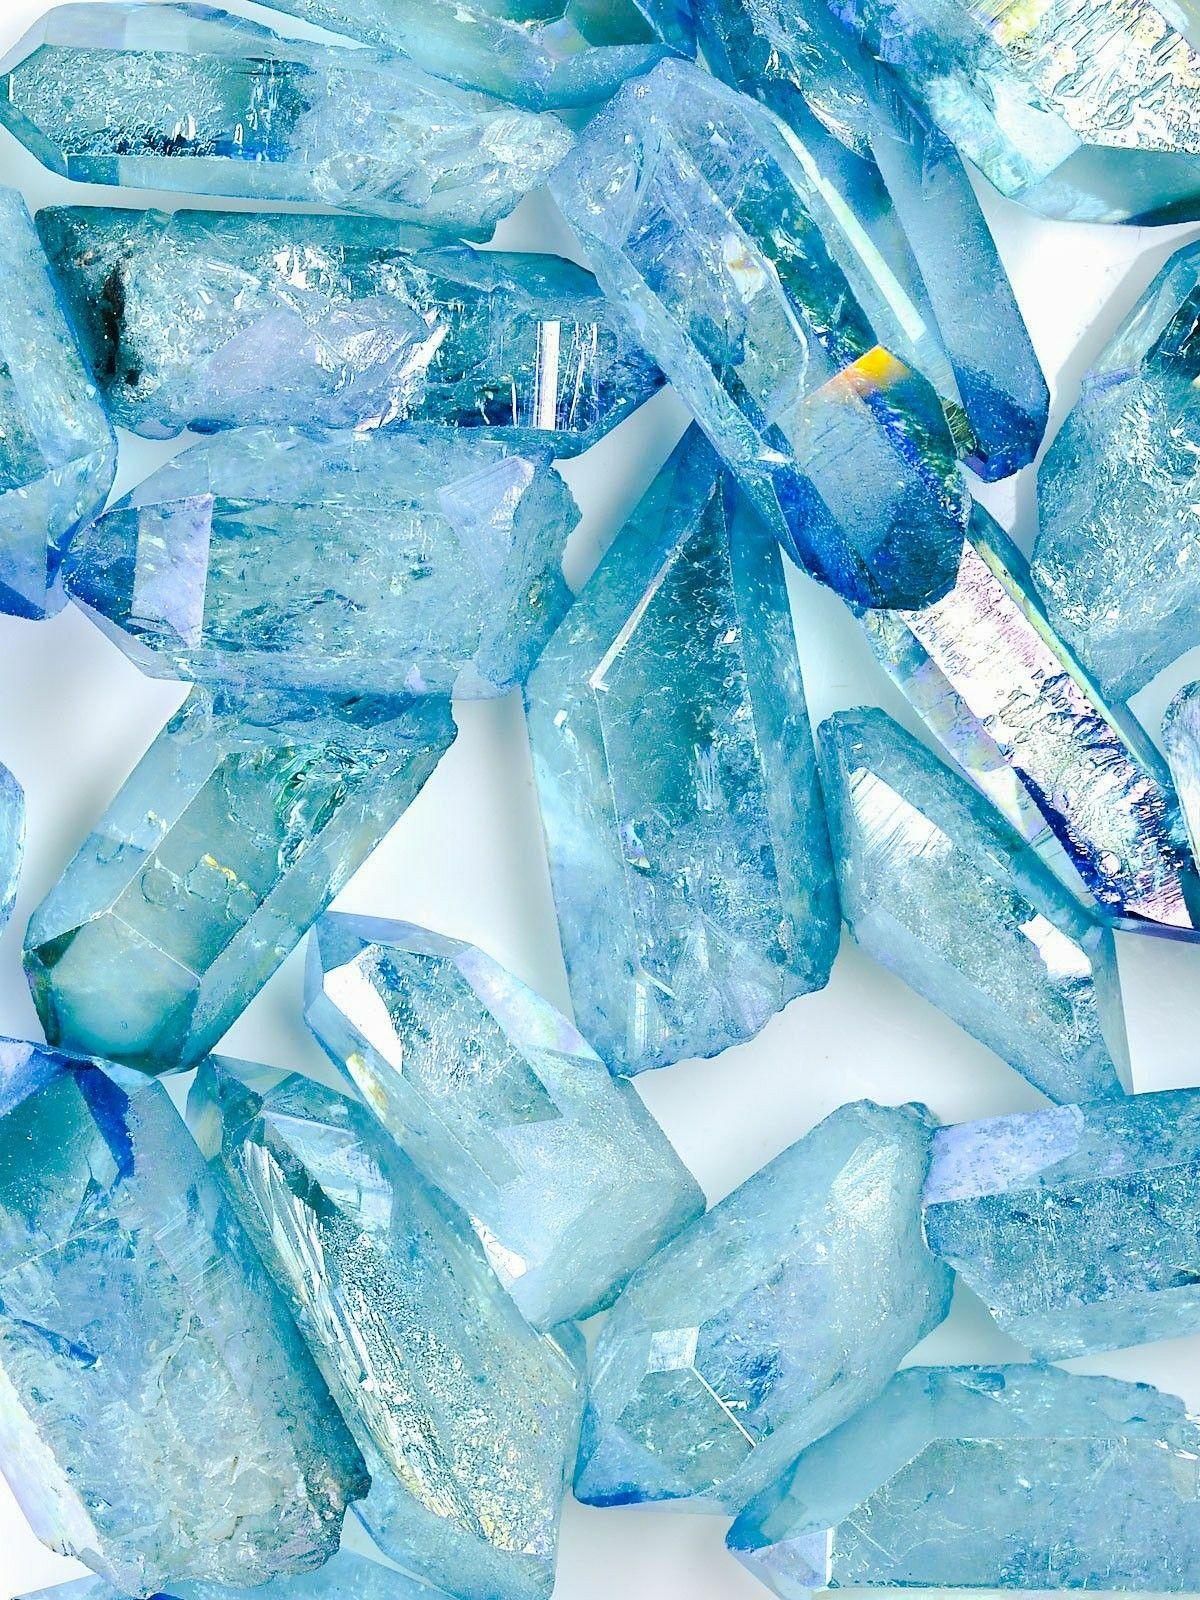 Ice Cream Neon Dreams Blue Aesthetic Pastel Blue Wallpaper Iphone Blue Aesthetic